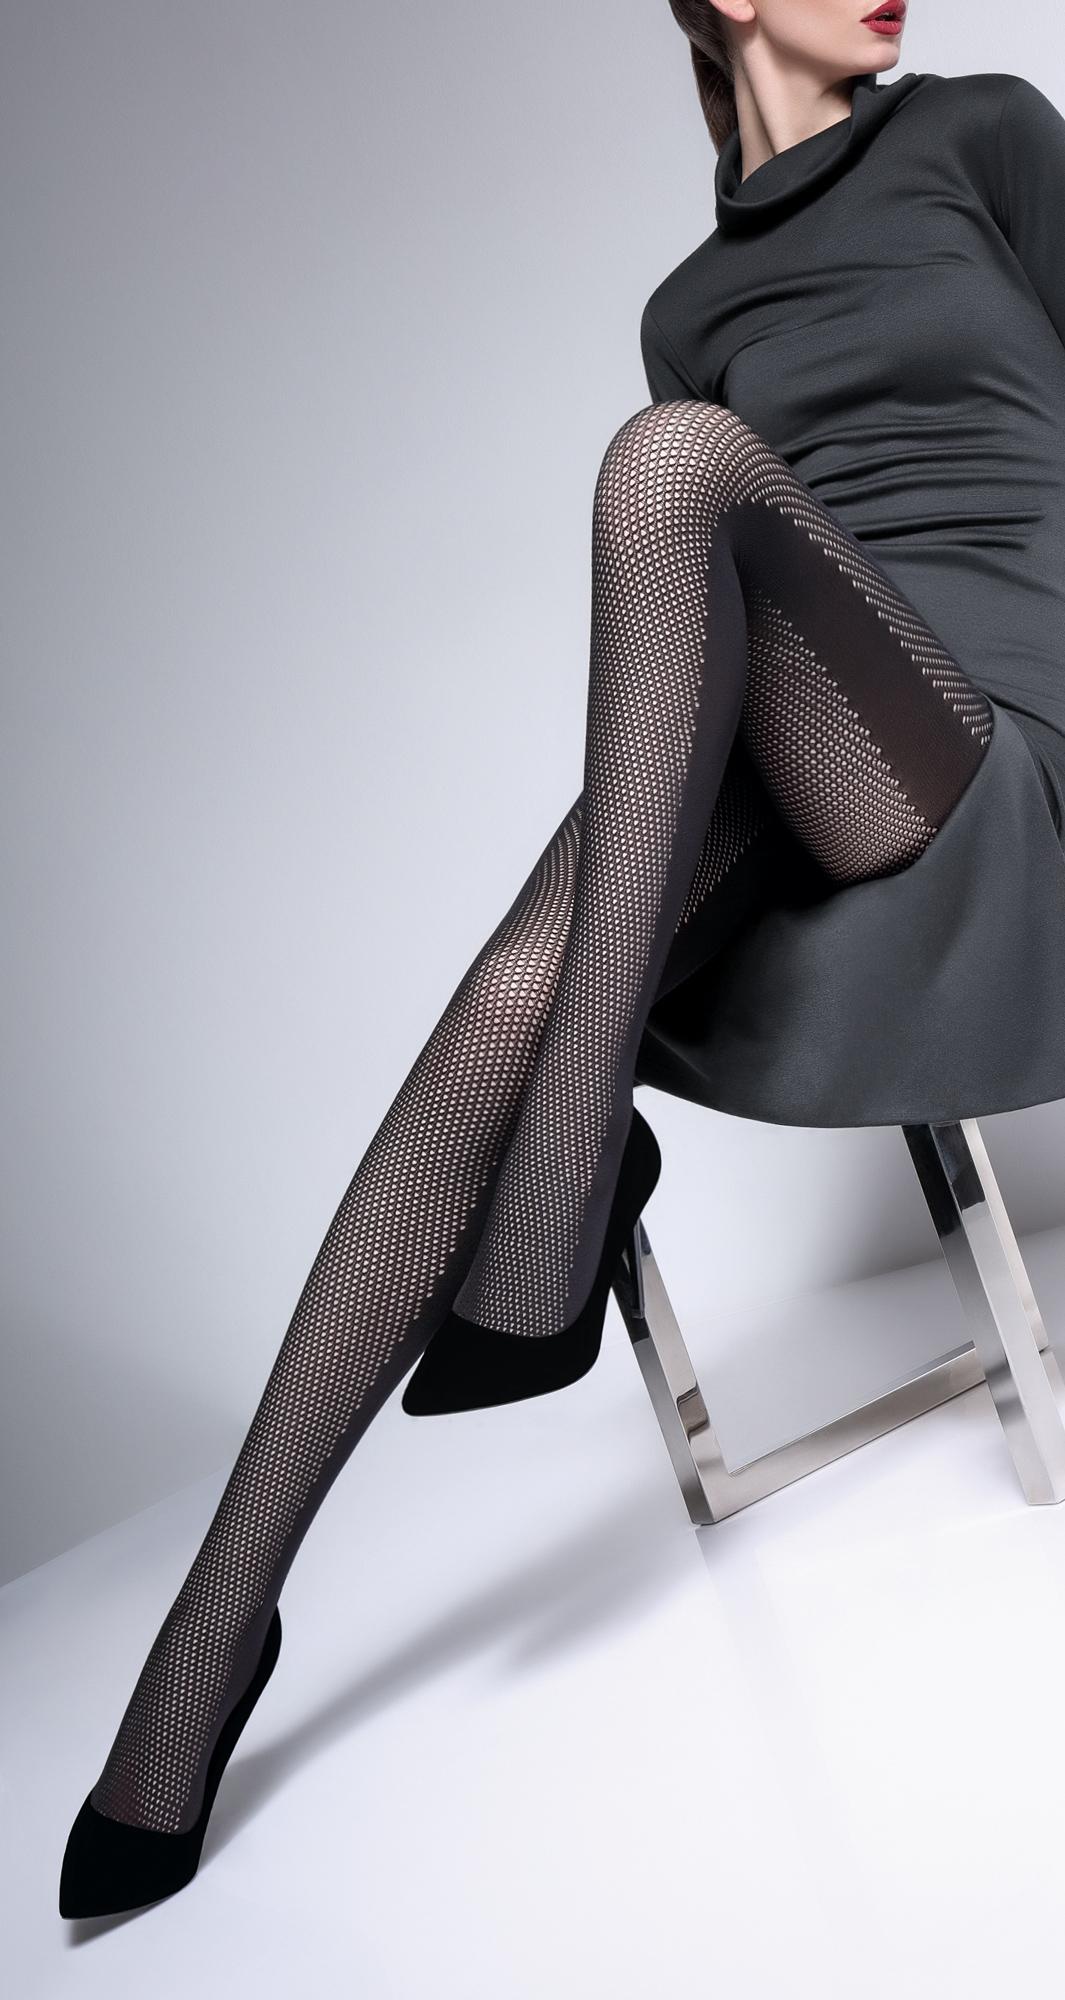 Колготки с рисунком Rete fashion 80 model 2